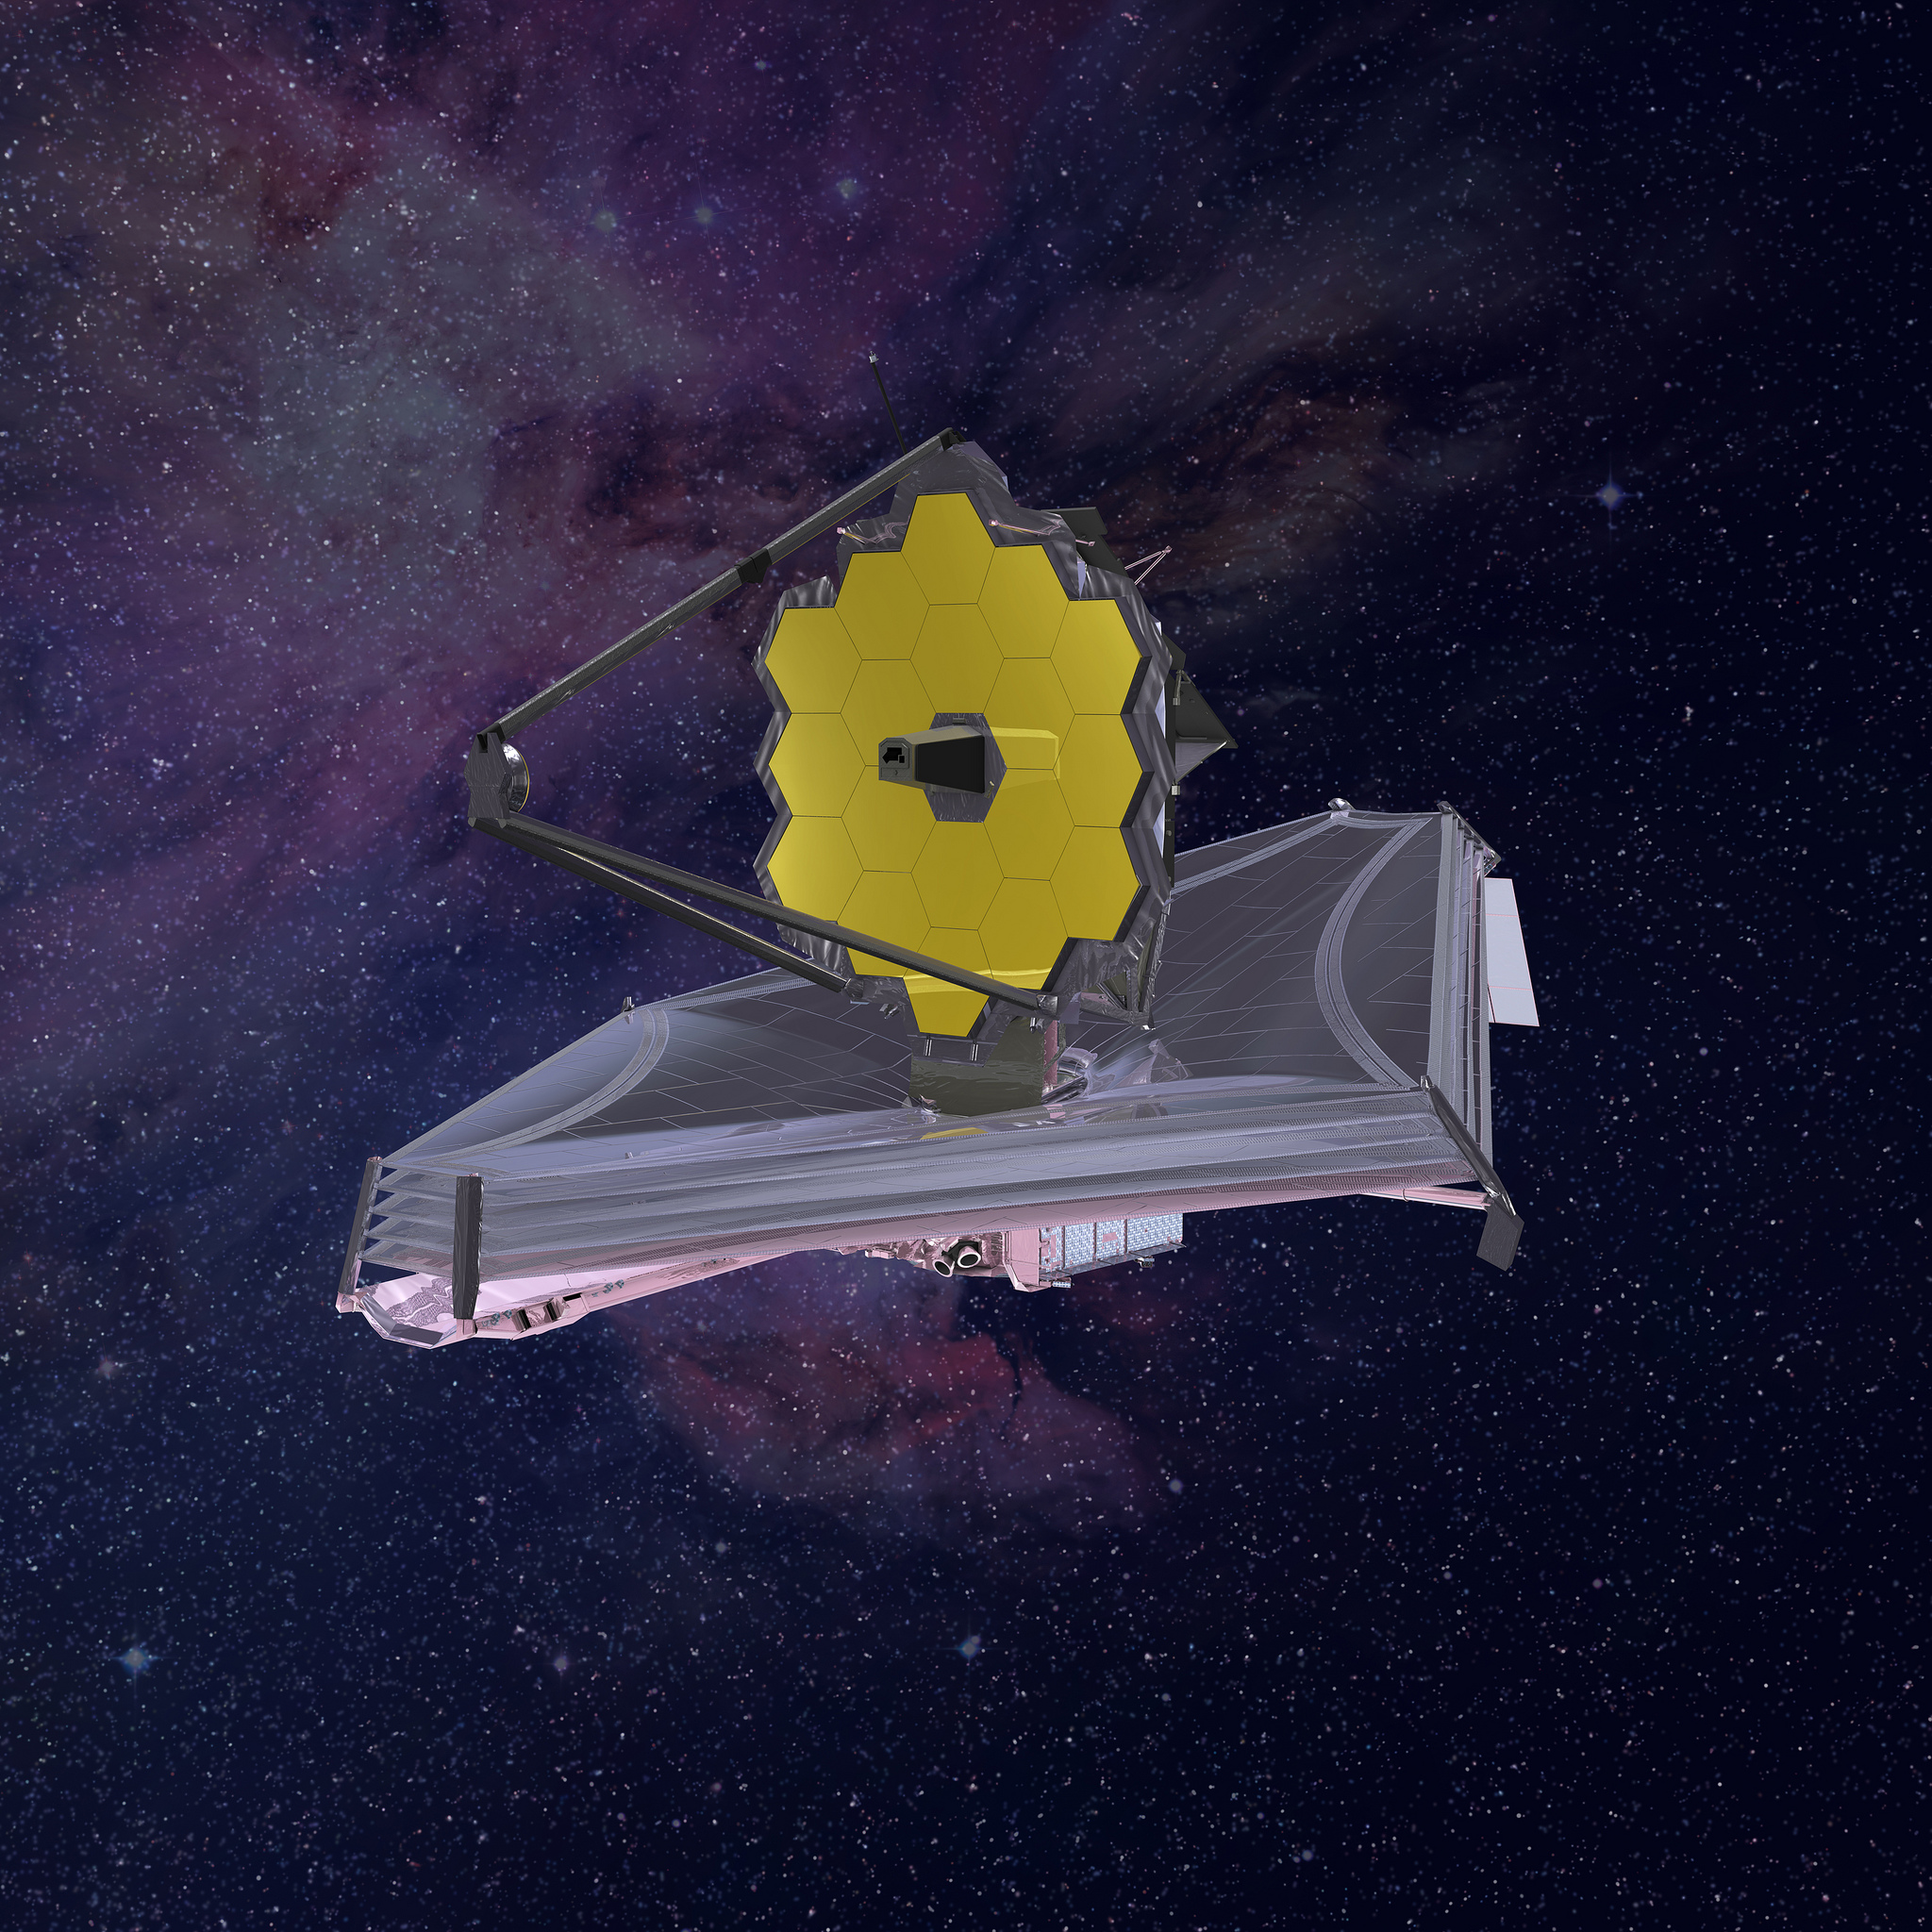 James Webb Space Telescope Artist Conception.Source: NASA,Image credit: Northrop Grumman